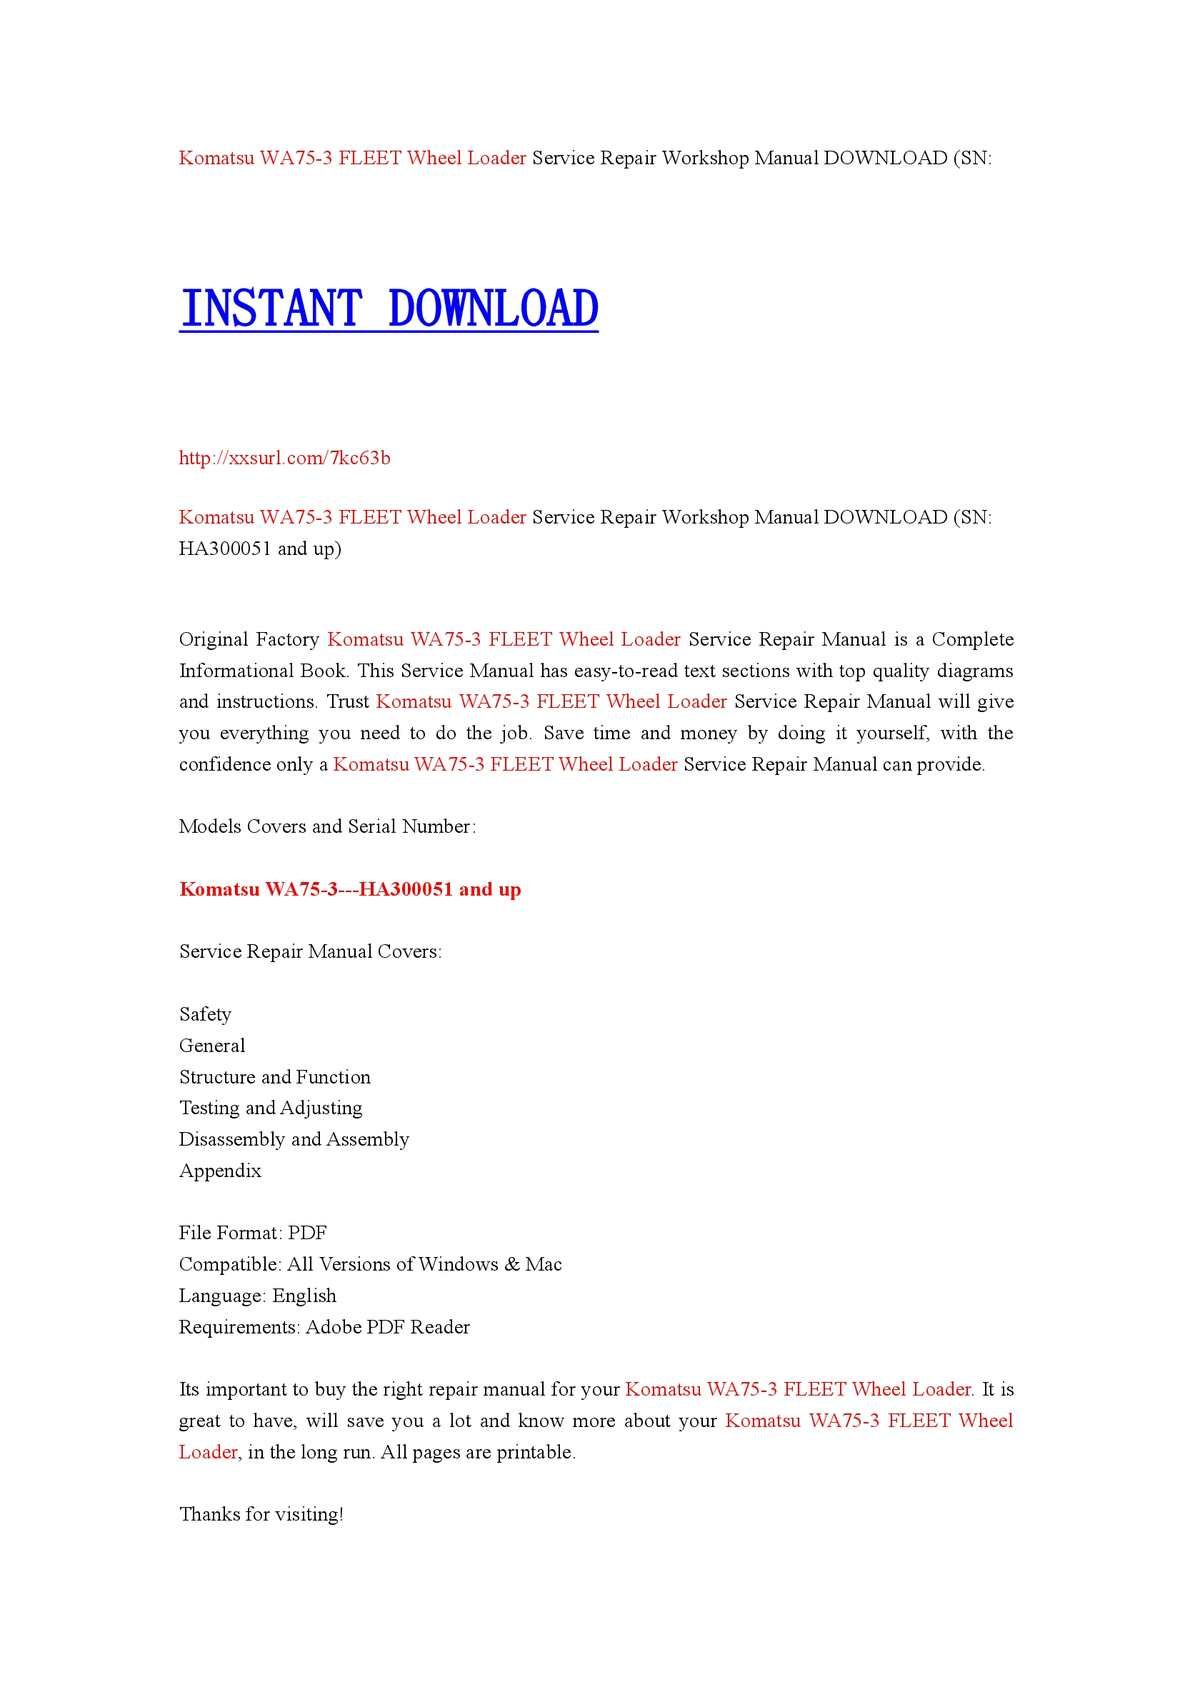 Komatsu WA75-3 Fleet Wheel Loader Shop Service Repair Manual